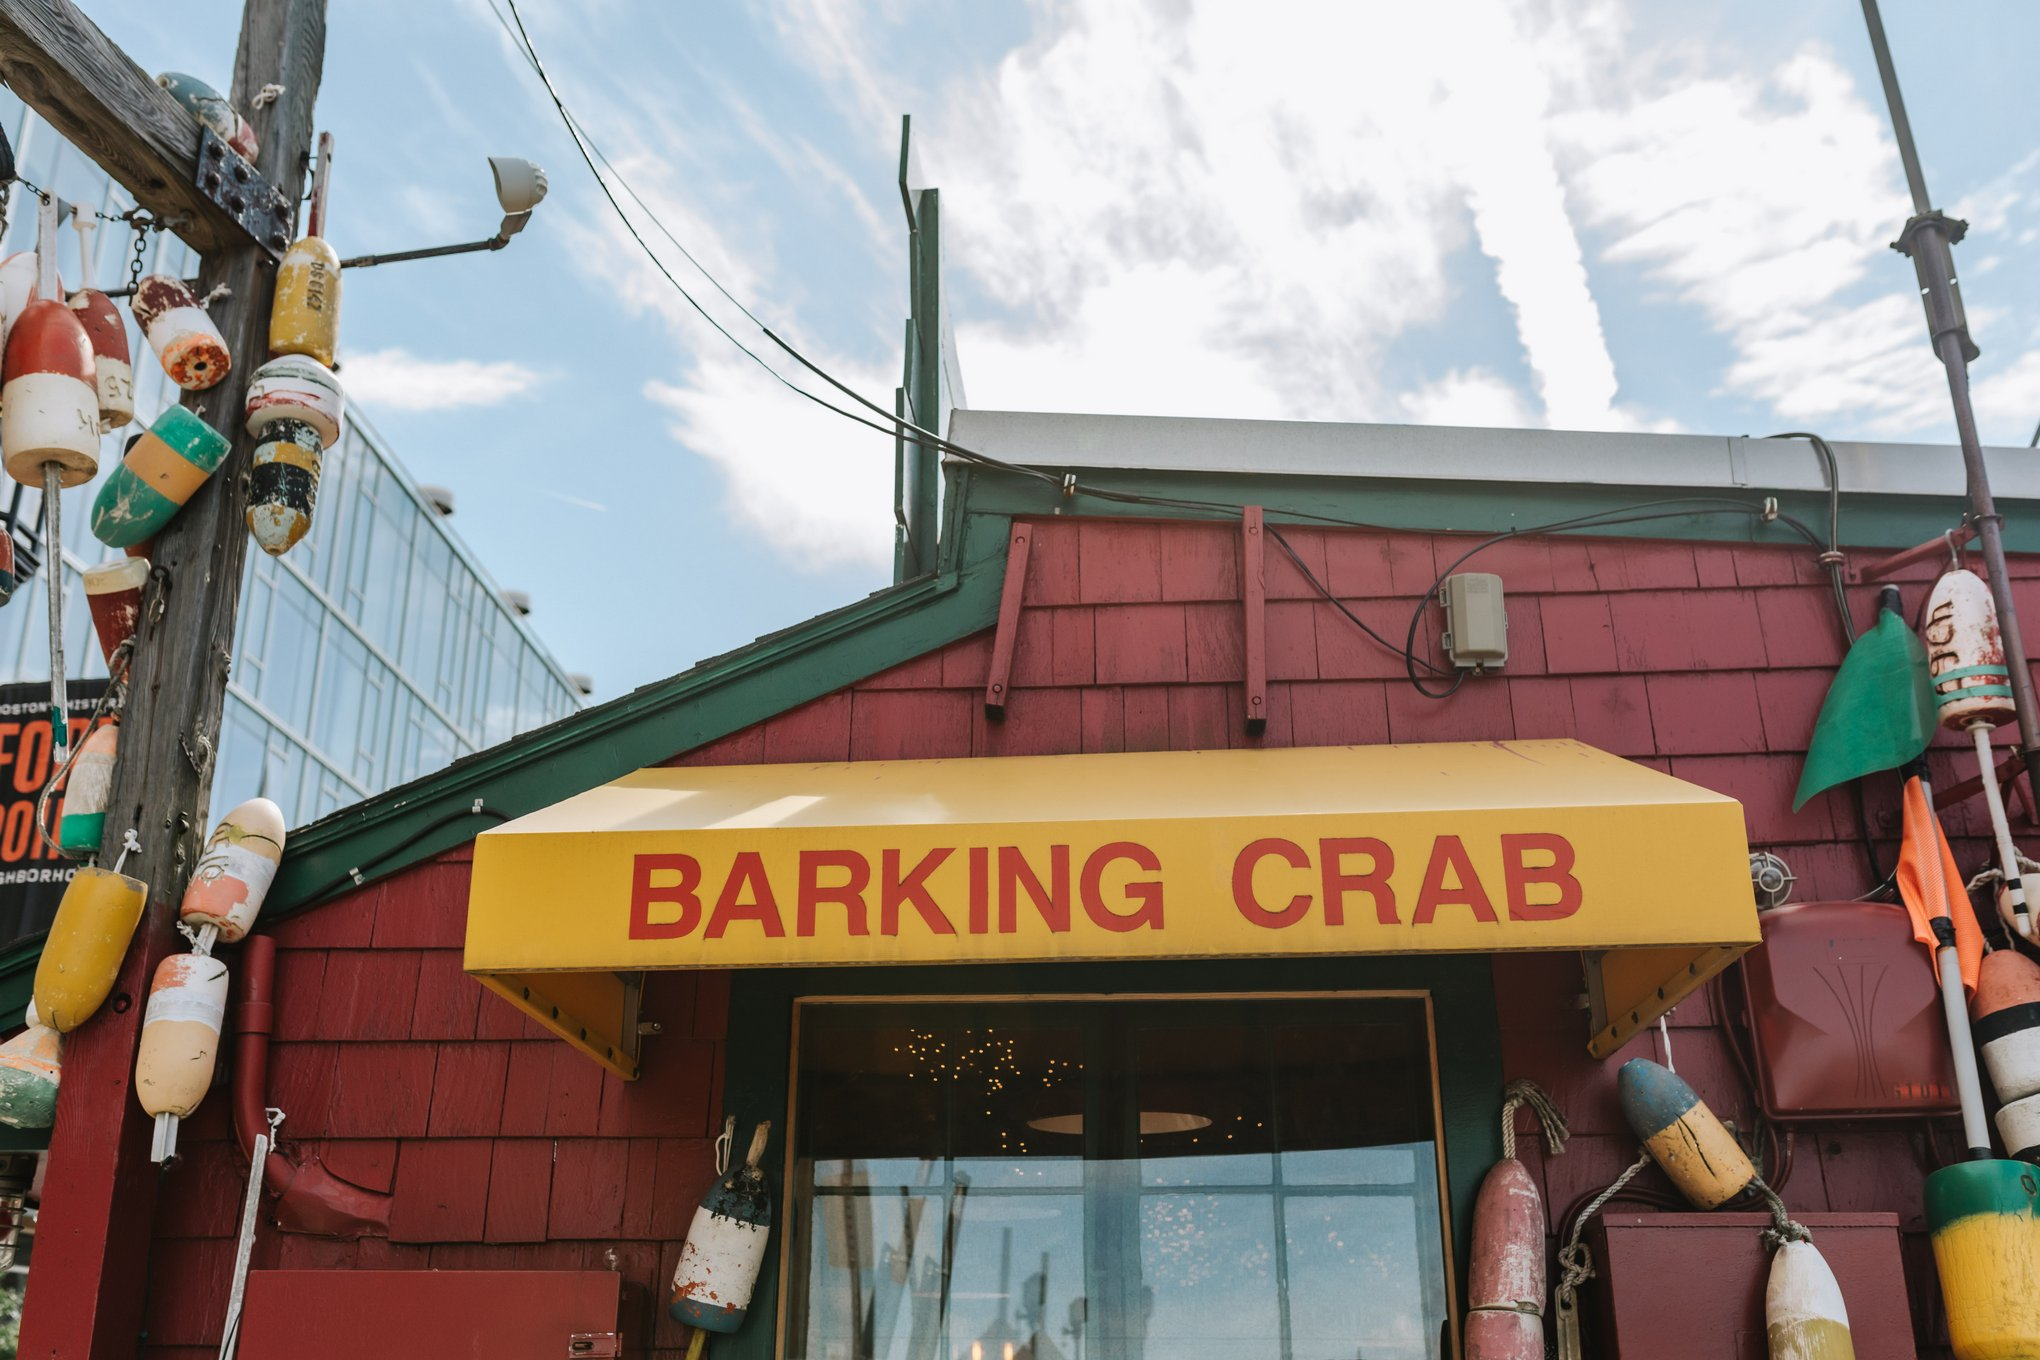 Barking-Crab-Seaport-East-Boston-Eastie-Wedding-33.jpg